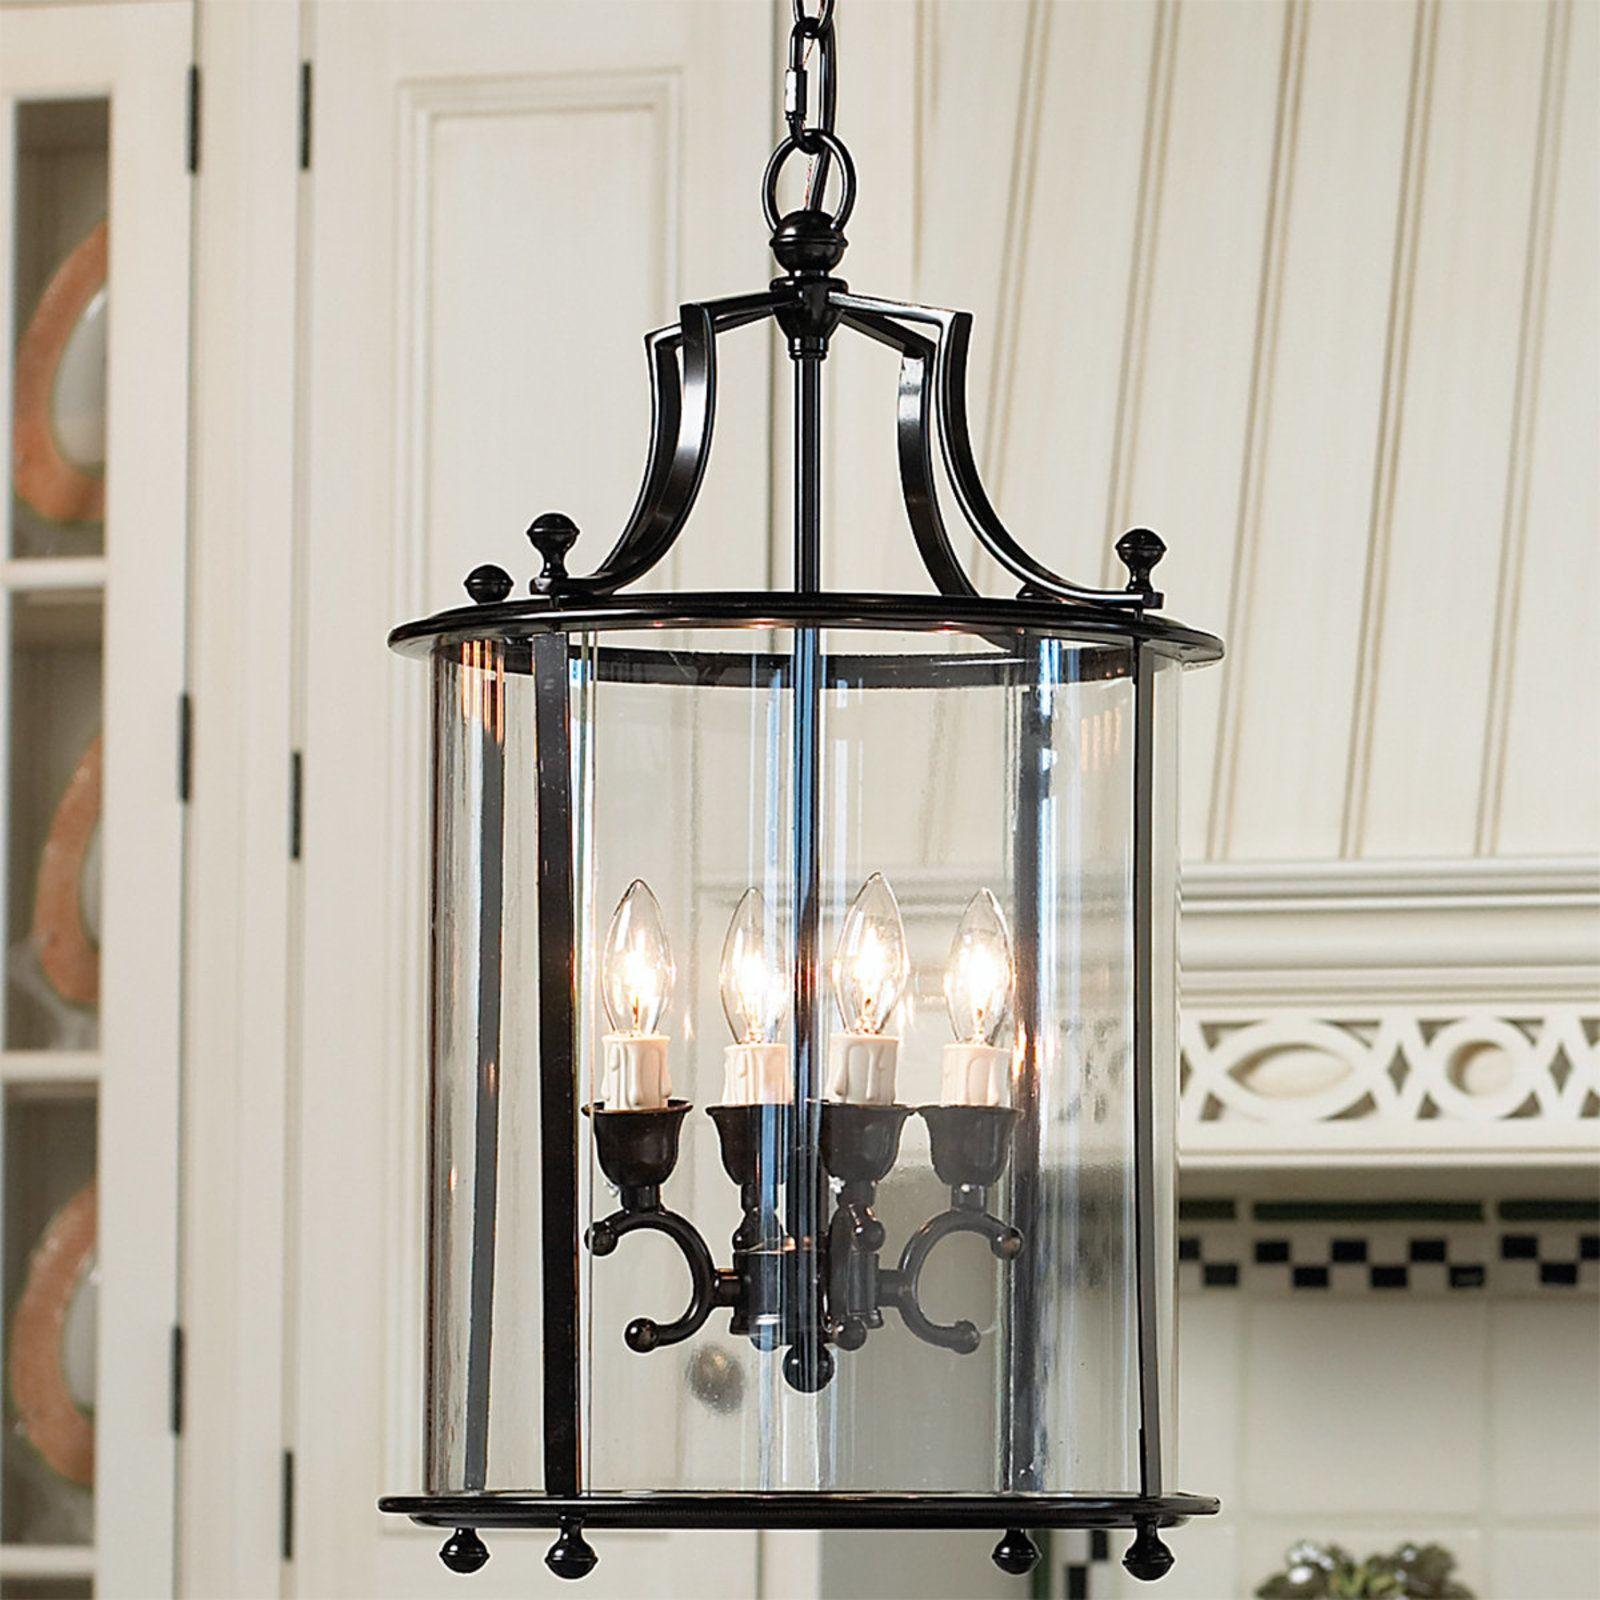 Entry or breakfast area heritage hanging lantern blackened bronze